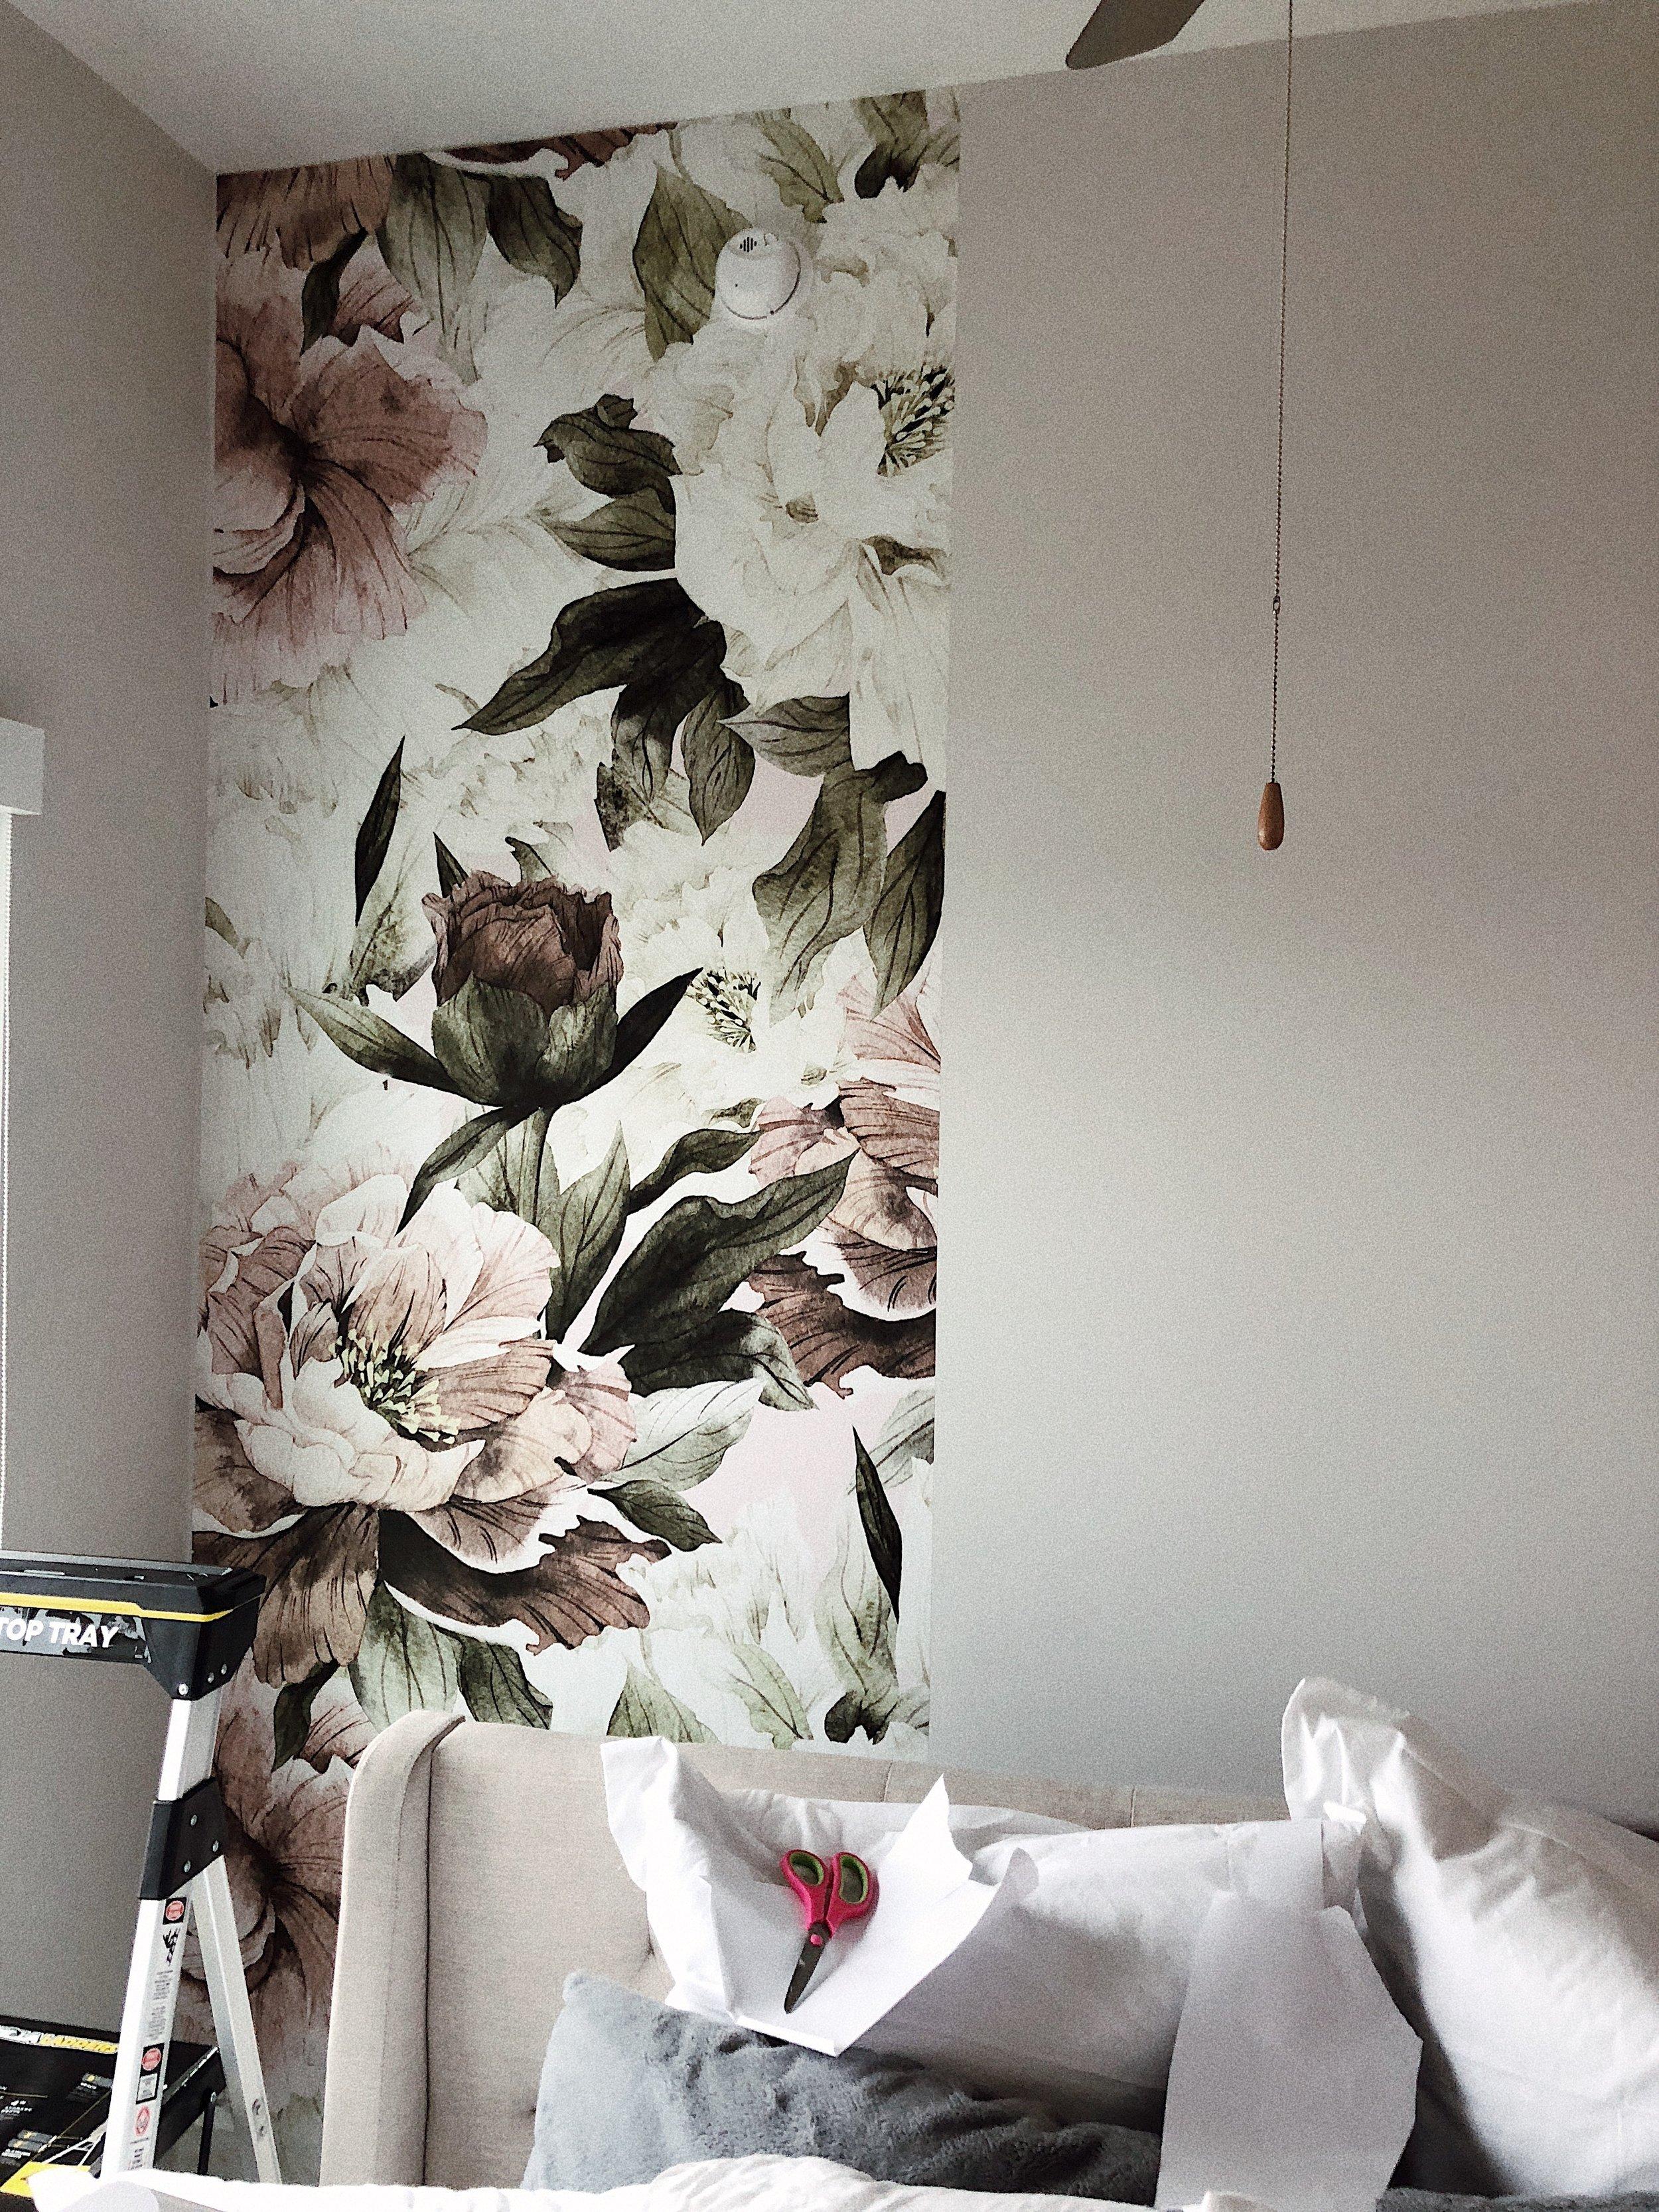 wallpaper installation miss lifestyler.JPG